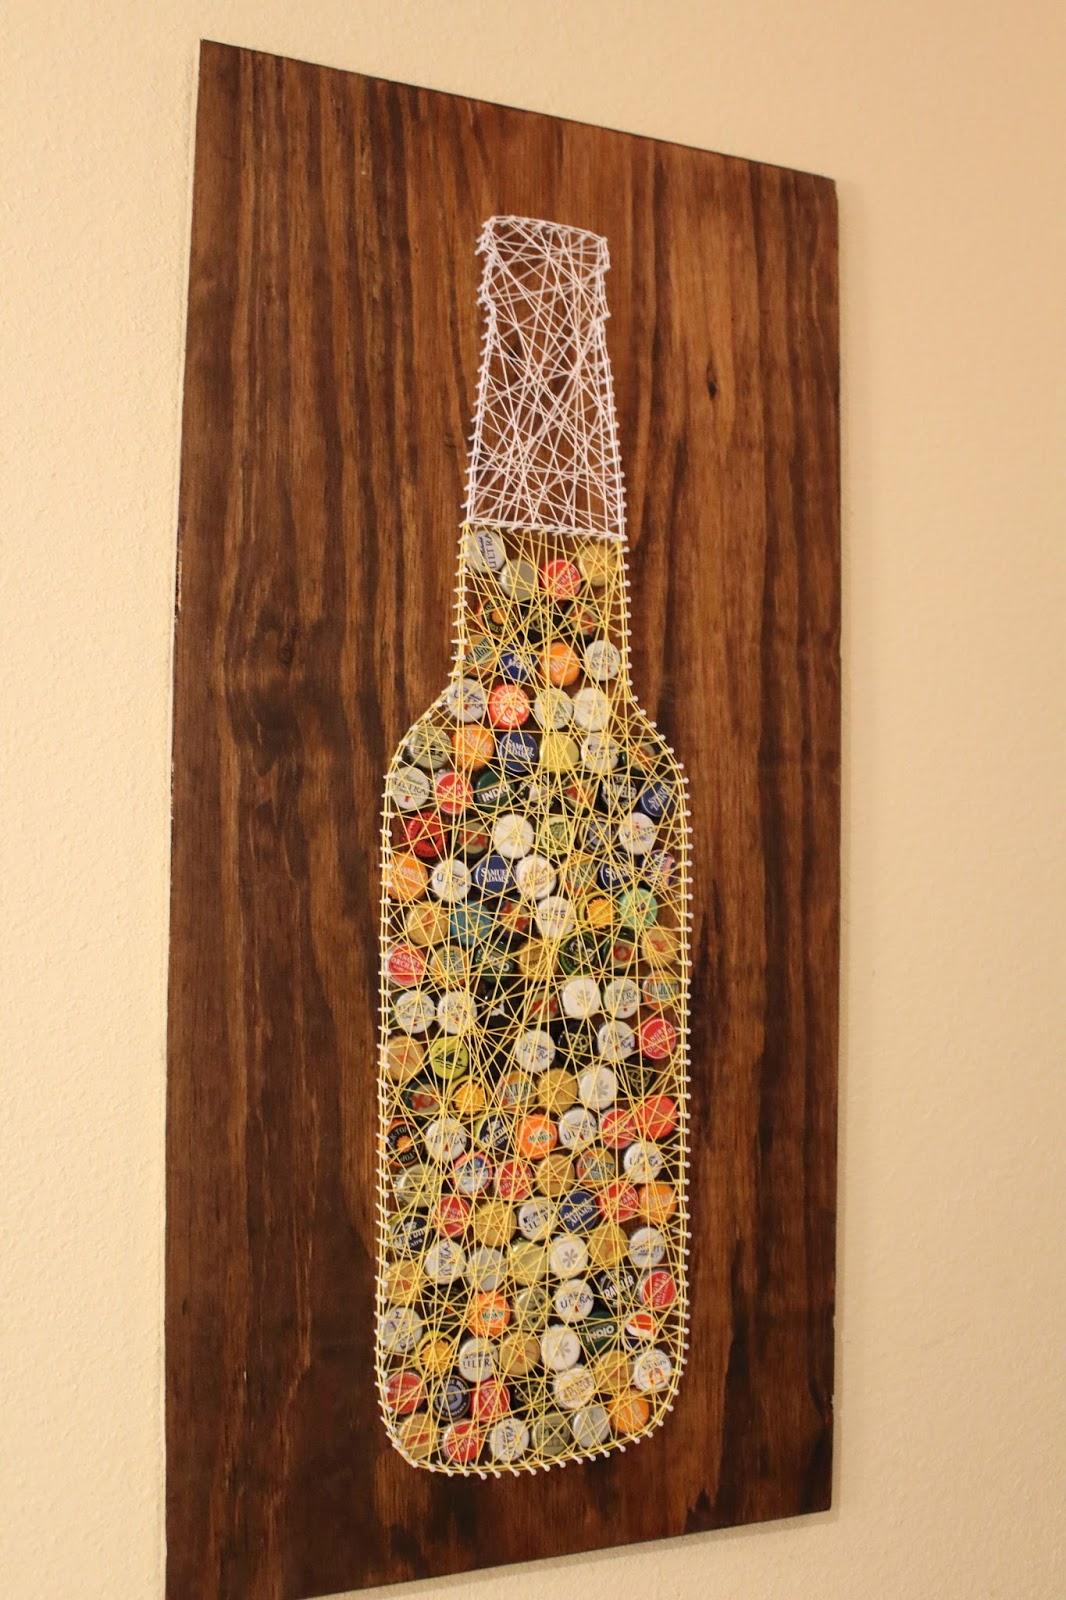 Diy bottle cap string art tutorial sam rhymes with ham for Bottle cap mural tutorial